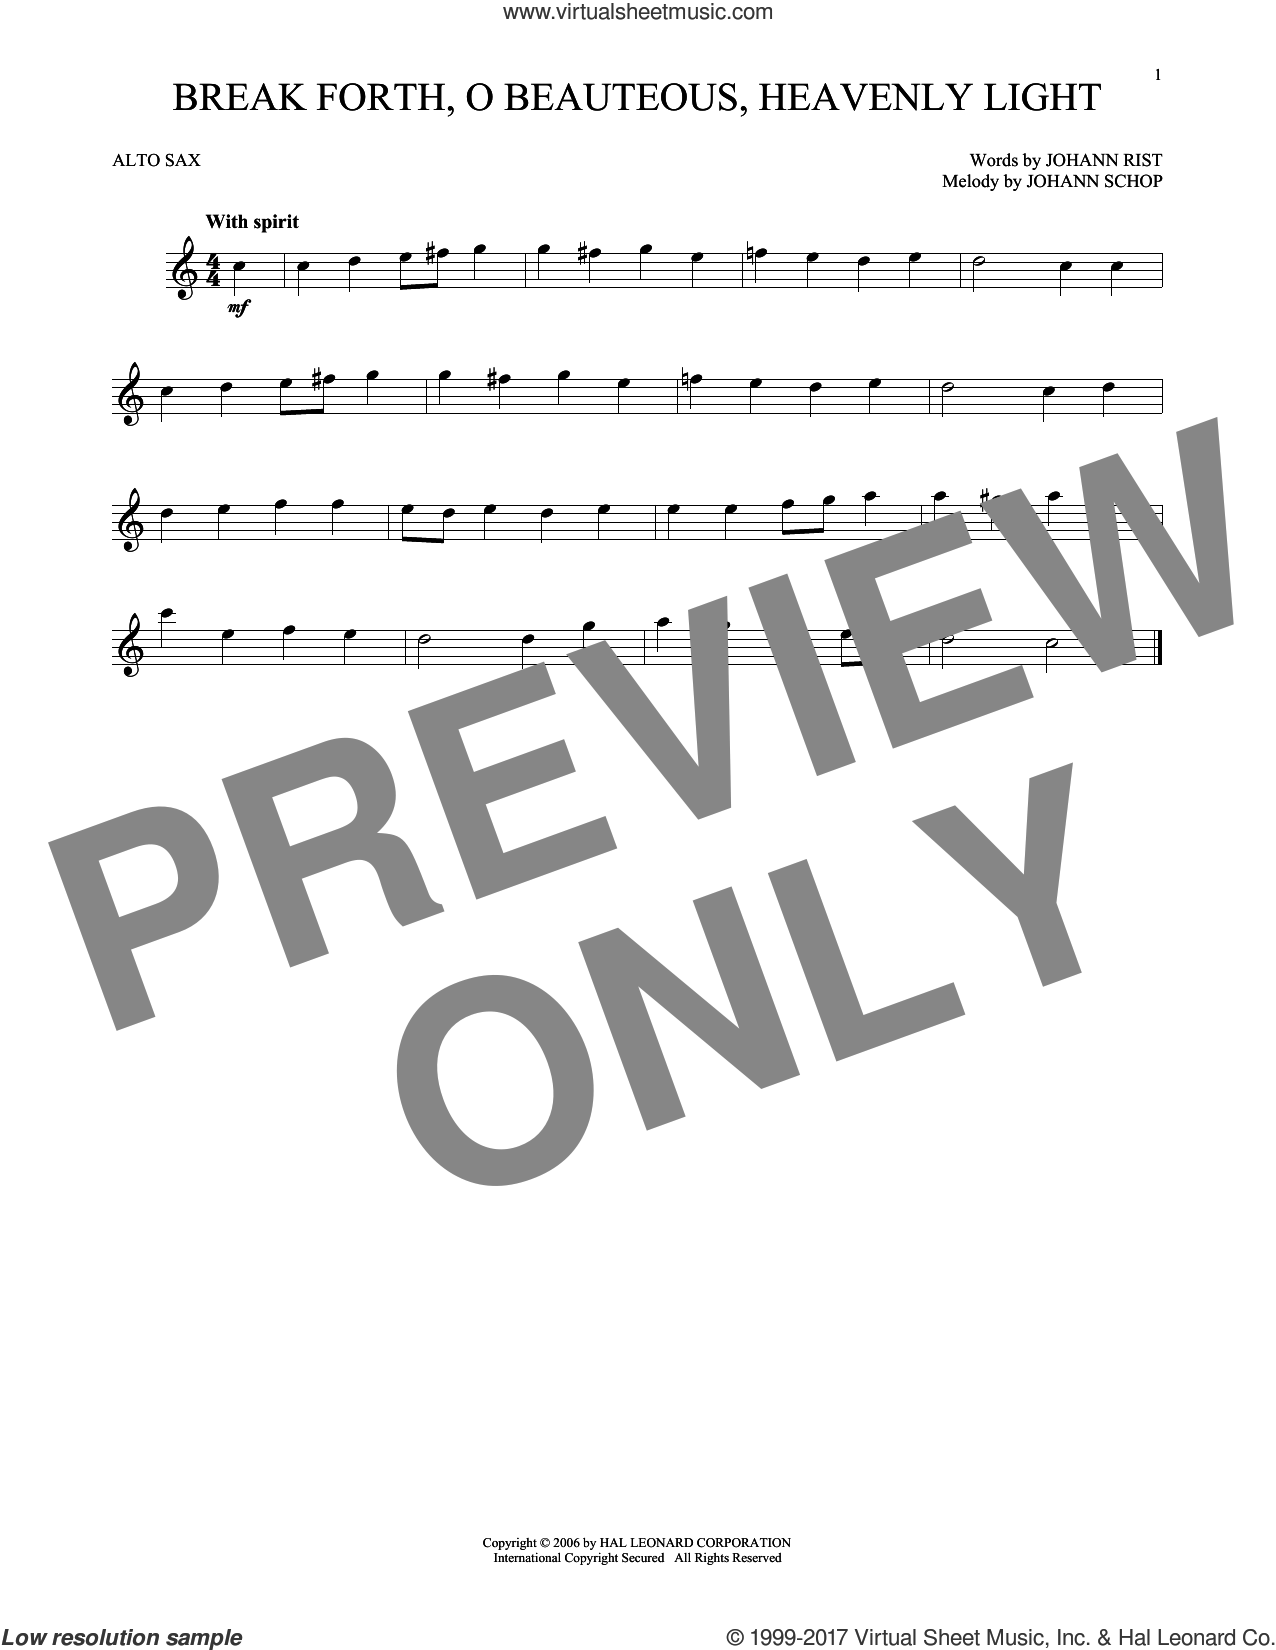 Break Forth, O Beauteous, Heavenly Light sheet music for alto saxophone solo by Johann Sebastian Bach, Johann Rist, Johann Schop and John Troutbeck (trans.), classical score, intermediate skill level